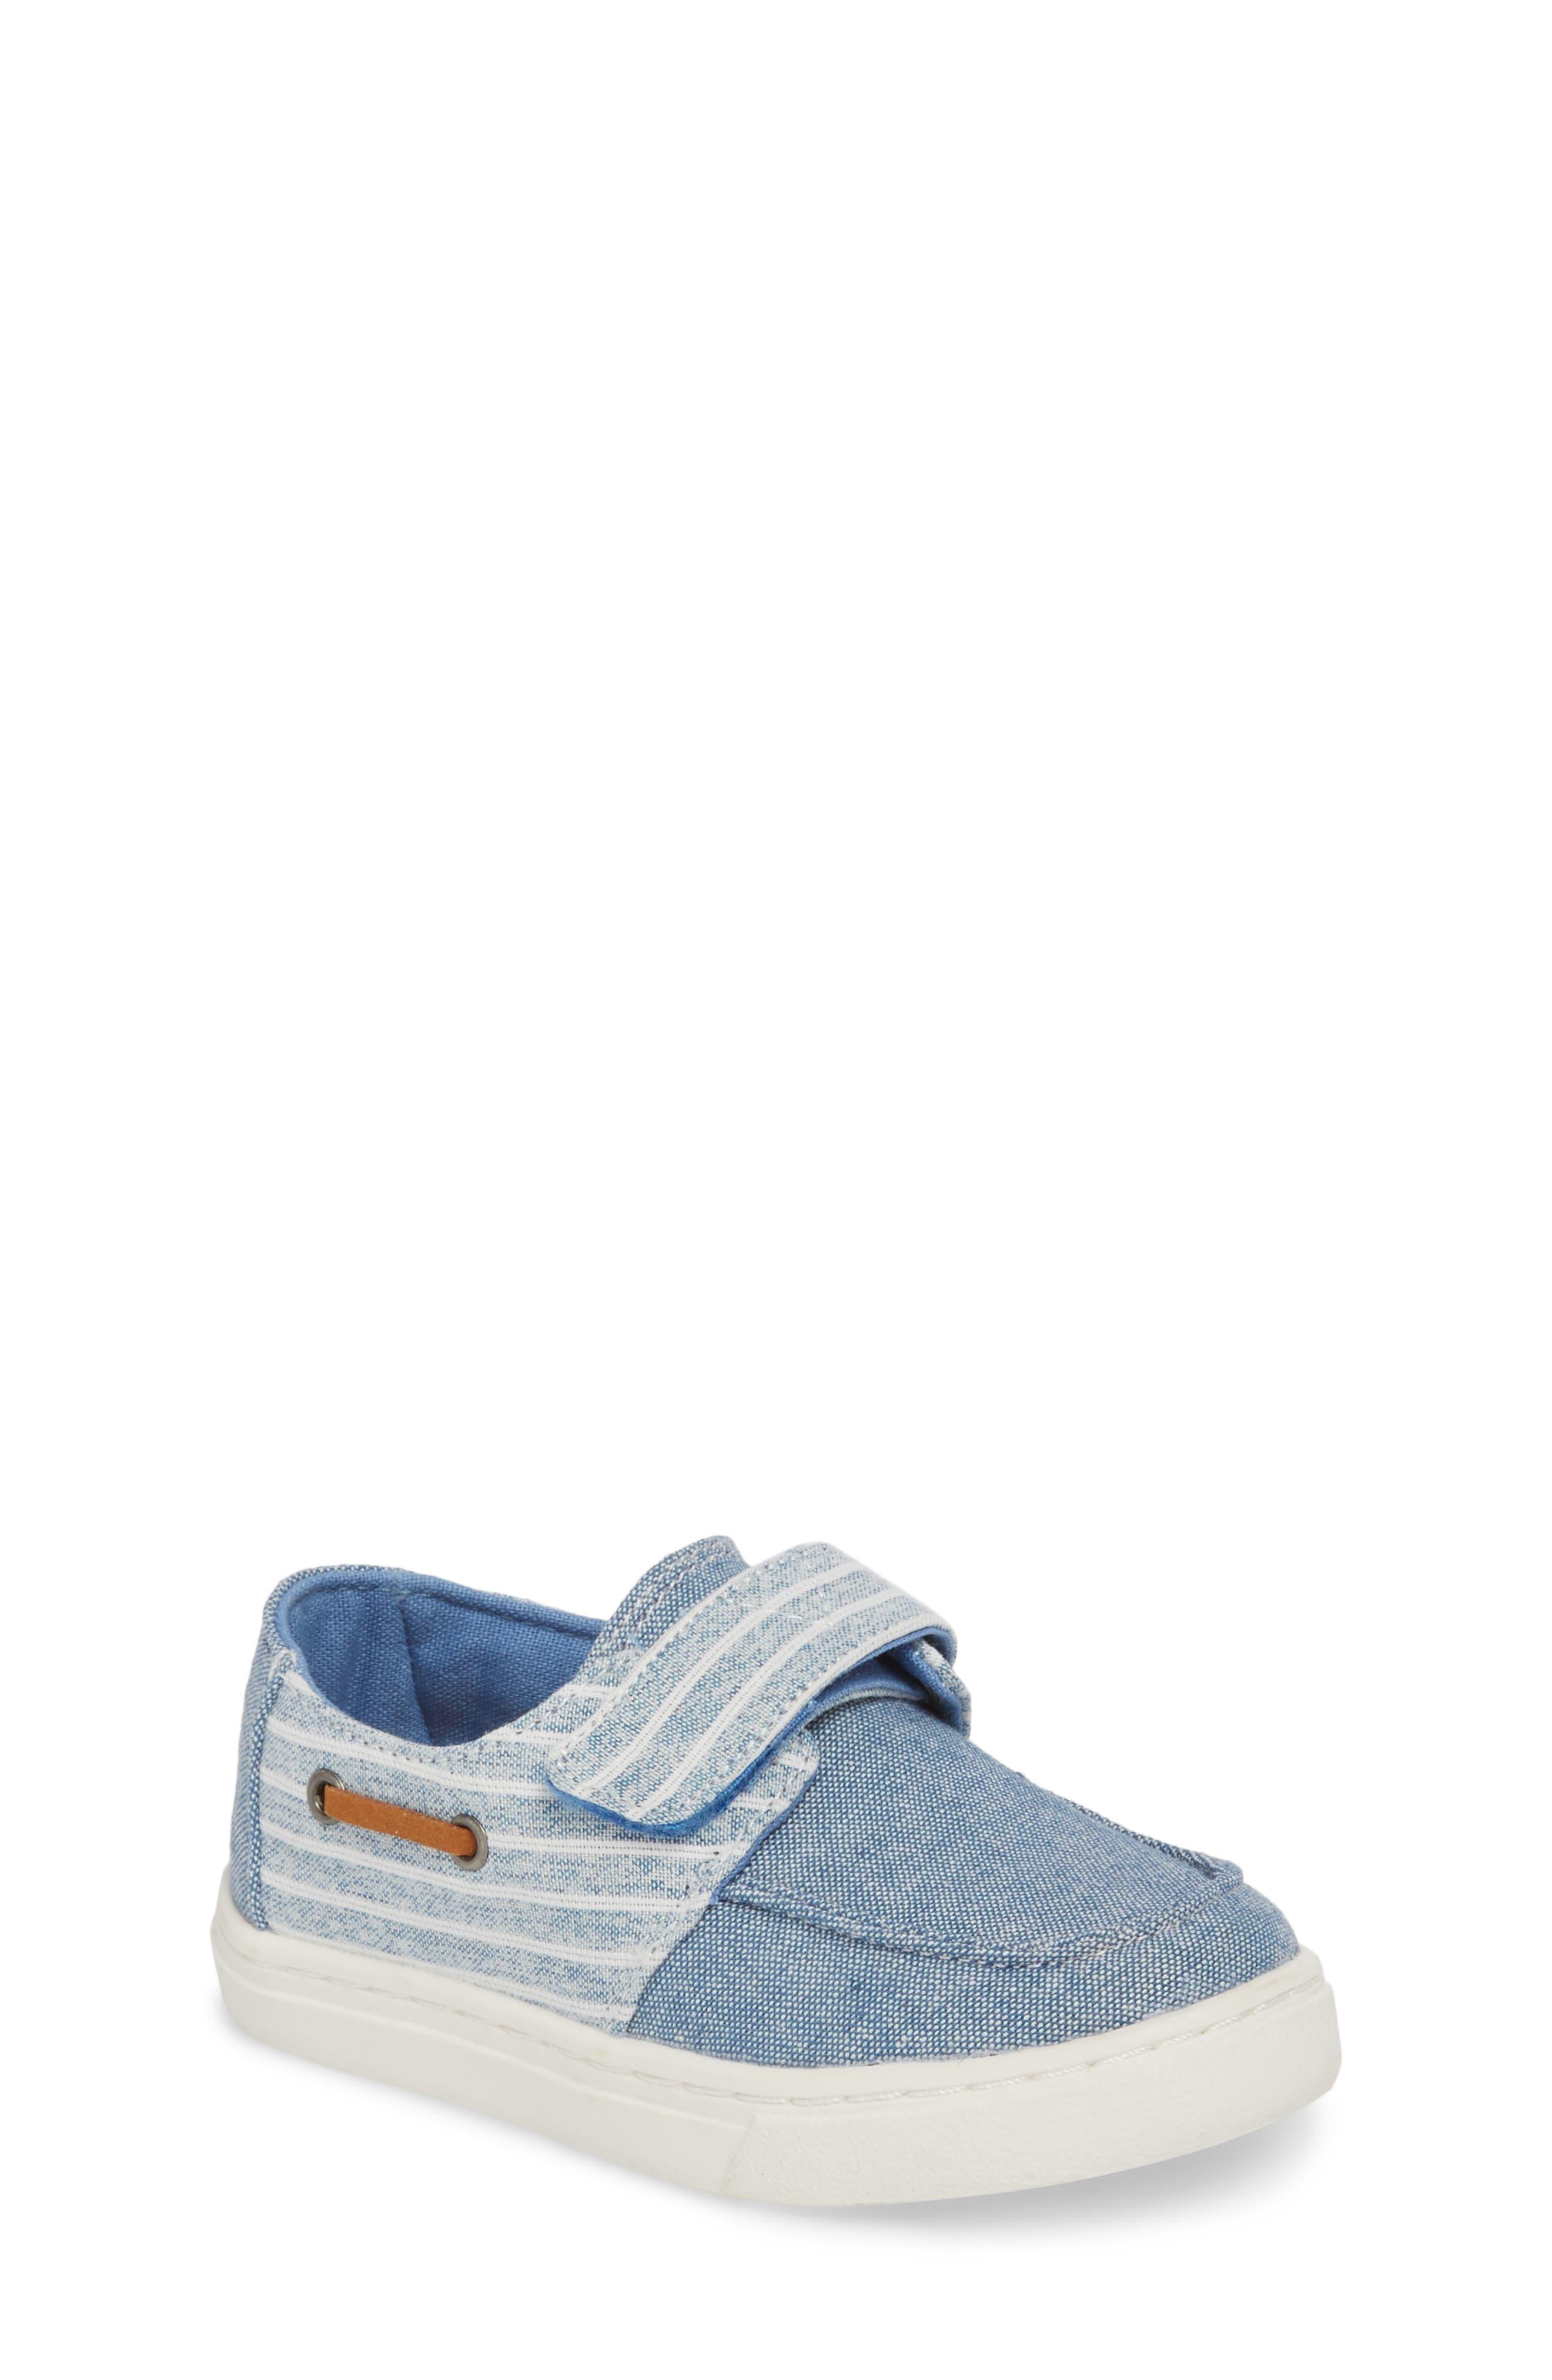 Culver Boat Shoe,                         Main,                         color, BLUE CHAMBRAY/ STRIPE